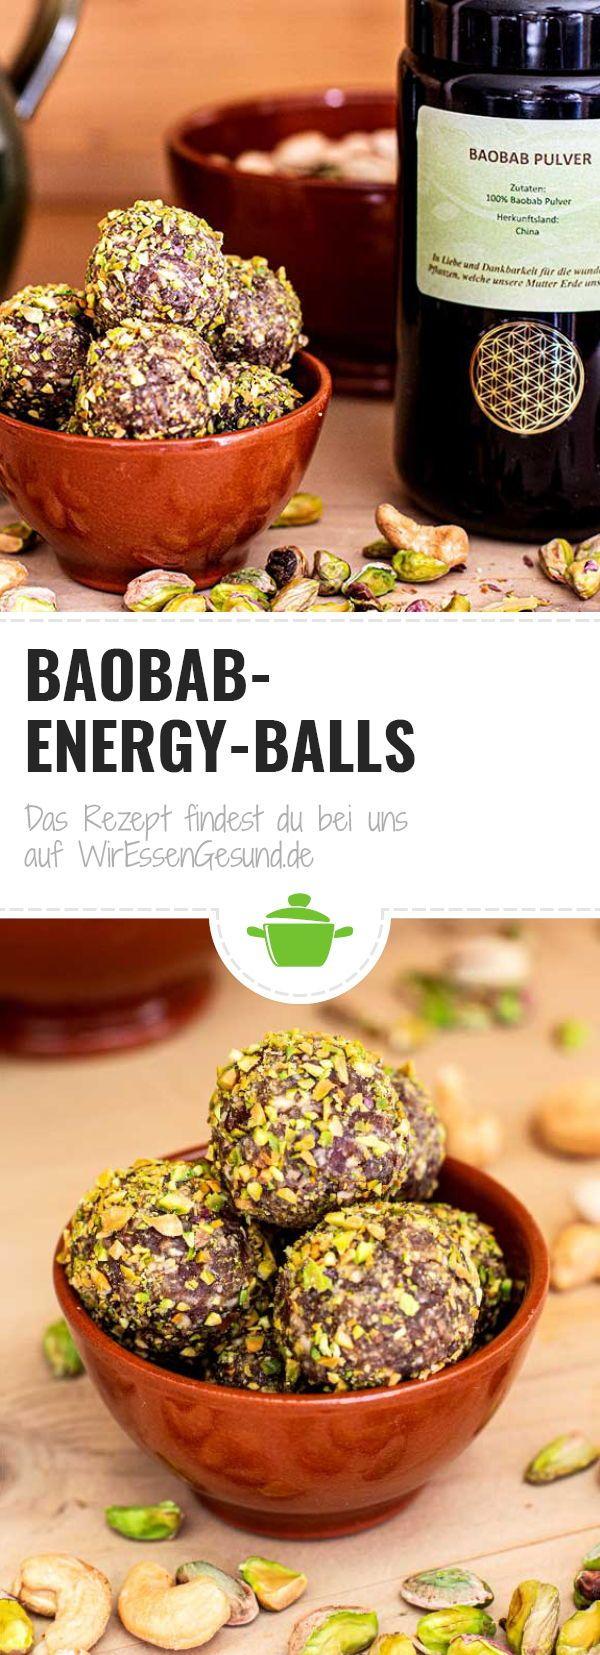 Baobab Energy Balls Wiressengesund Rezept Rezepte Gesunde Snacks Lecker Kochen